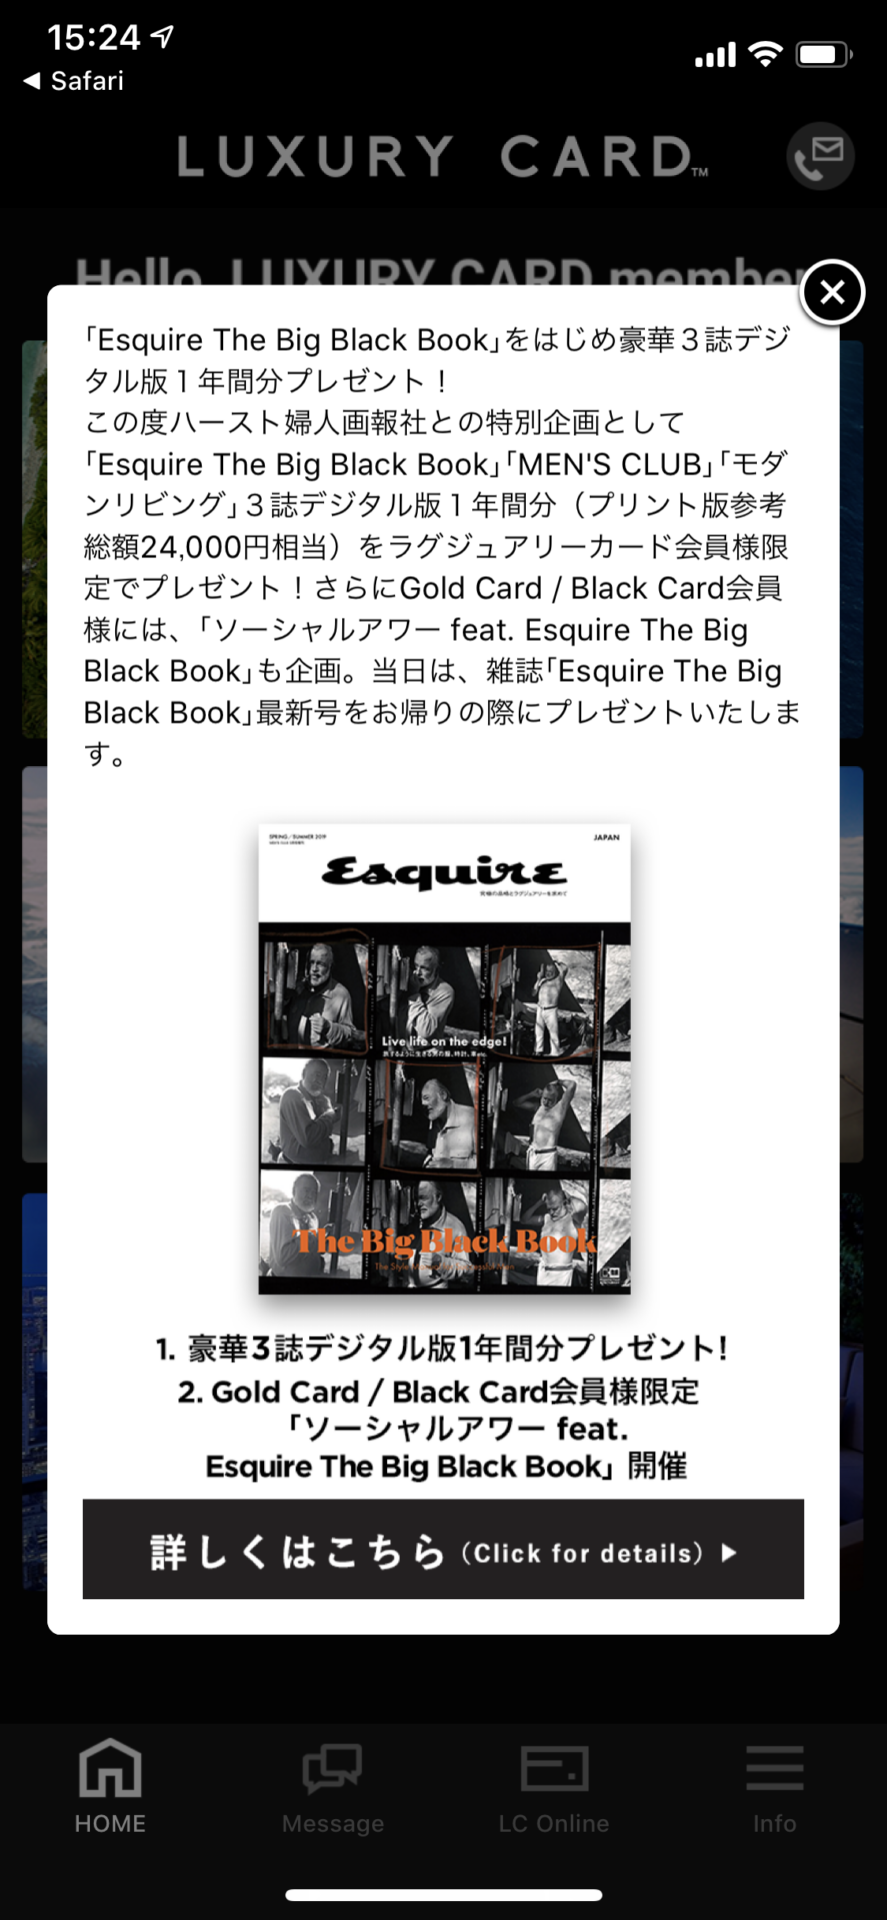 Esquire The Big Black Book等の3誌デジタル版1年分プレゼント